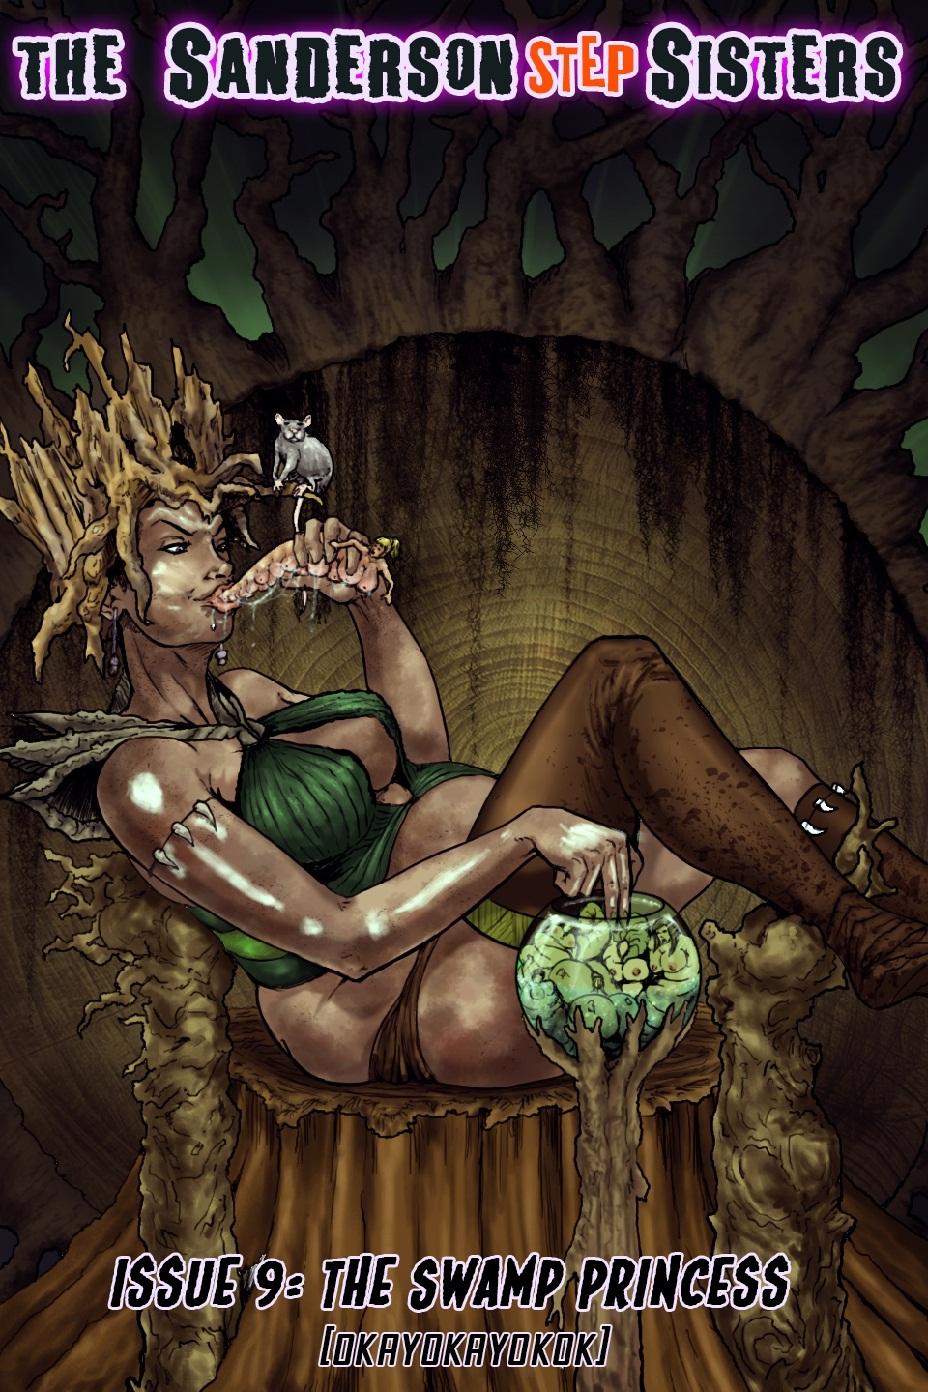 Porn Comics - Sanderson Step Sisters Issu. 9 Swamp Princess porn comics 8 muses